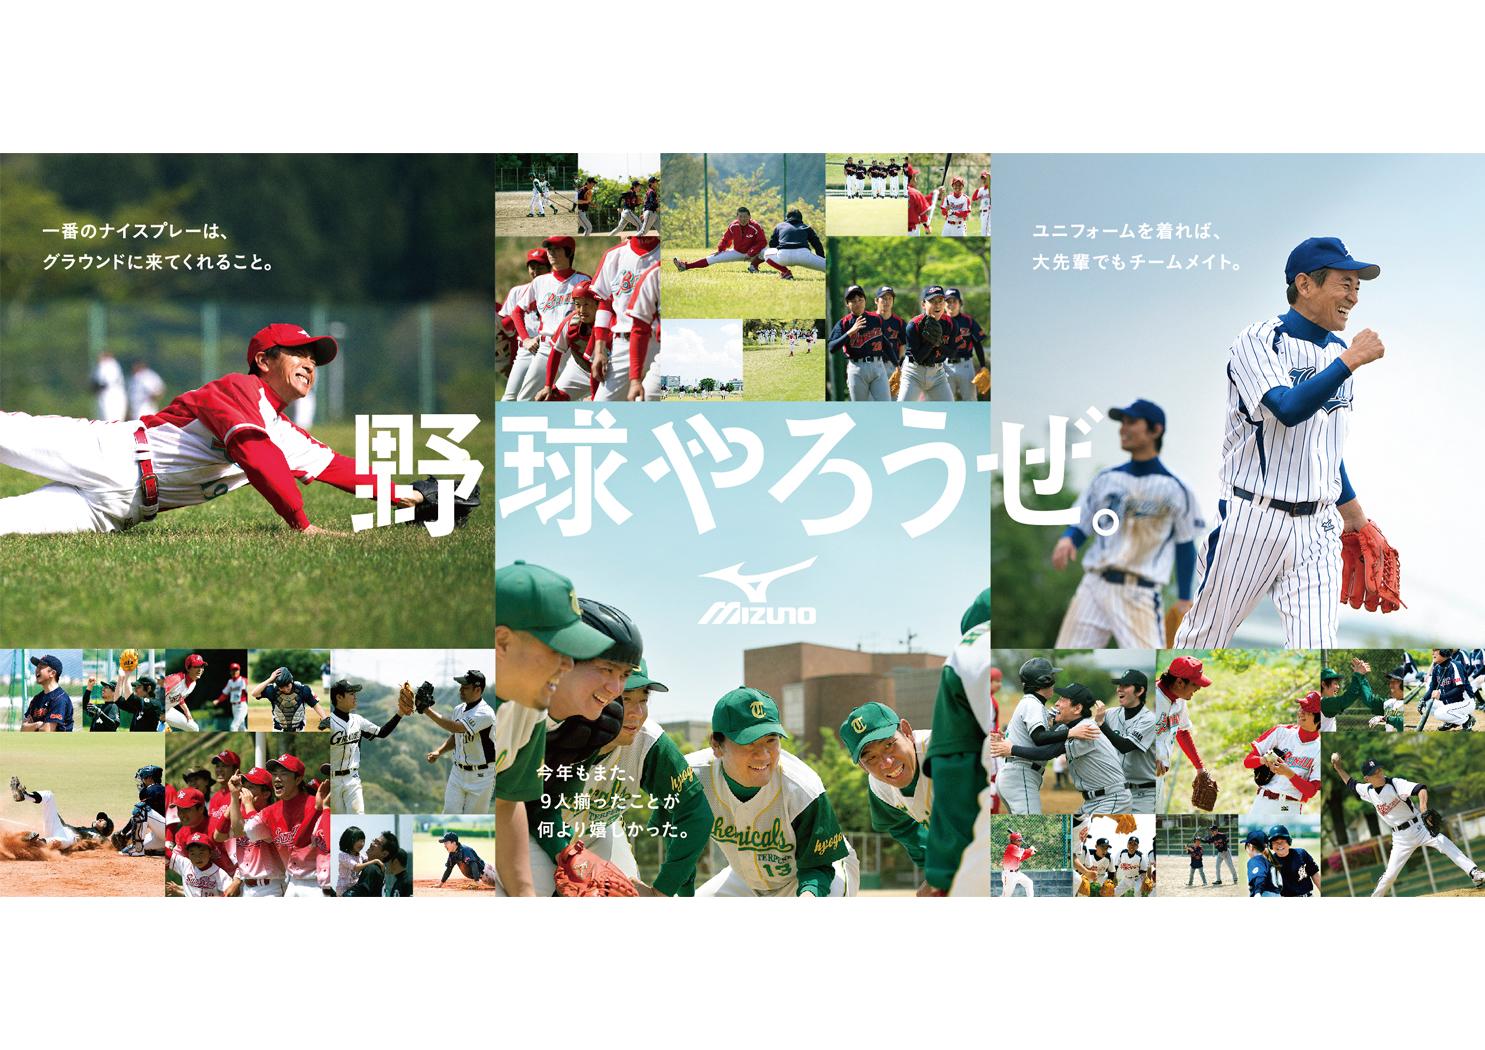 Mizuno Baseball tapestry 2014